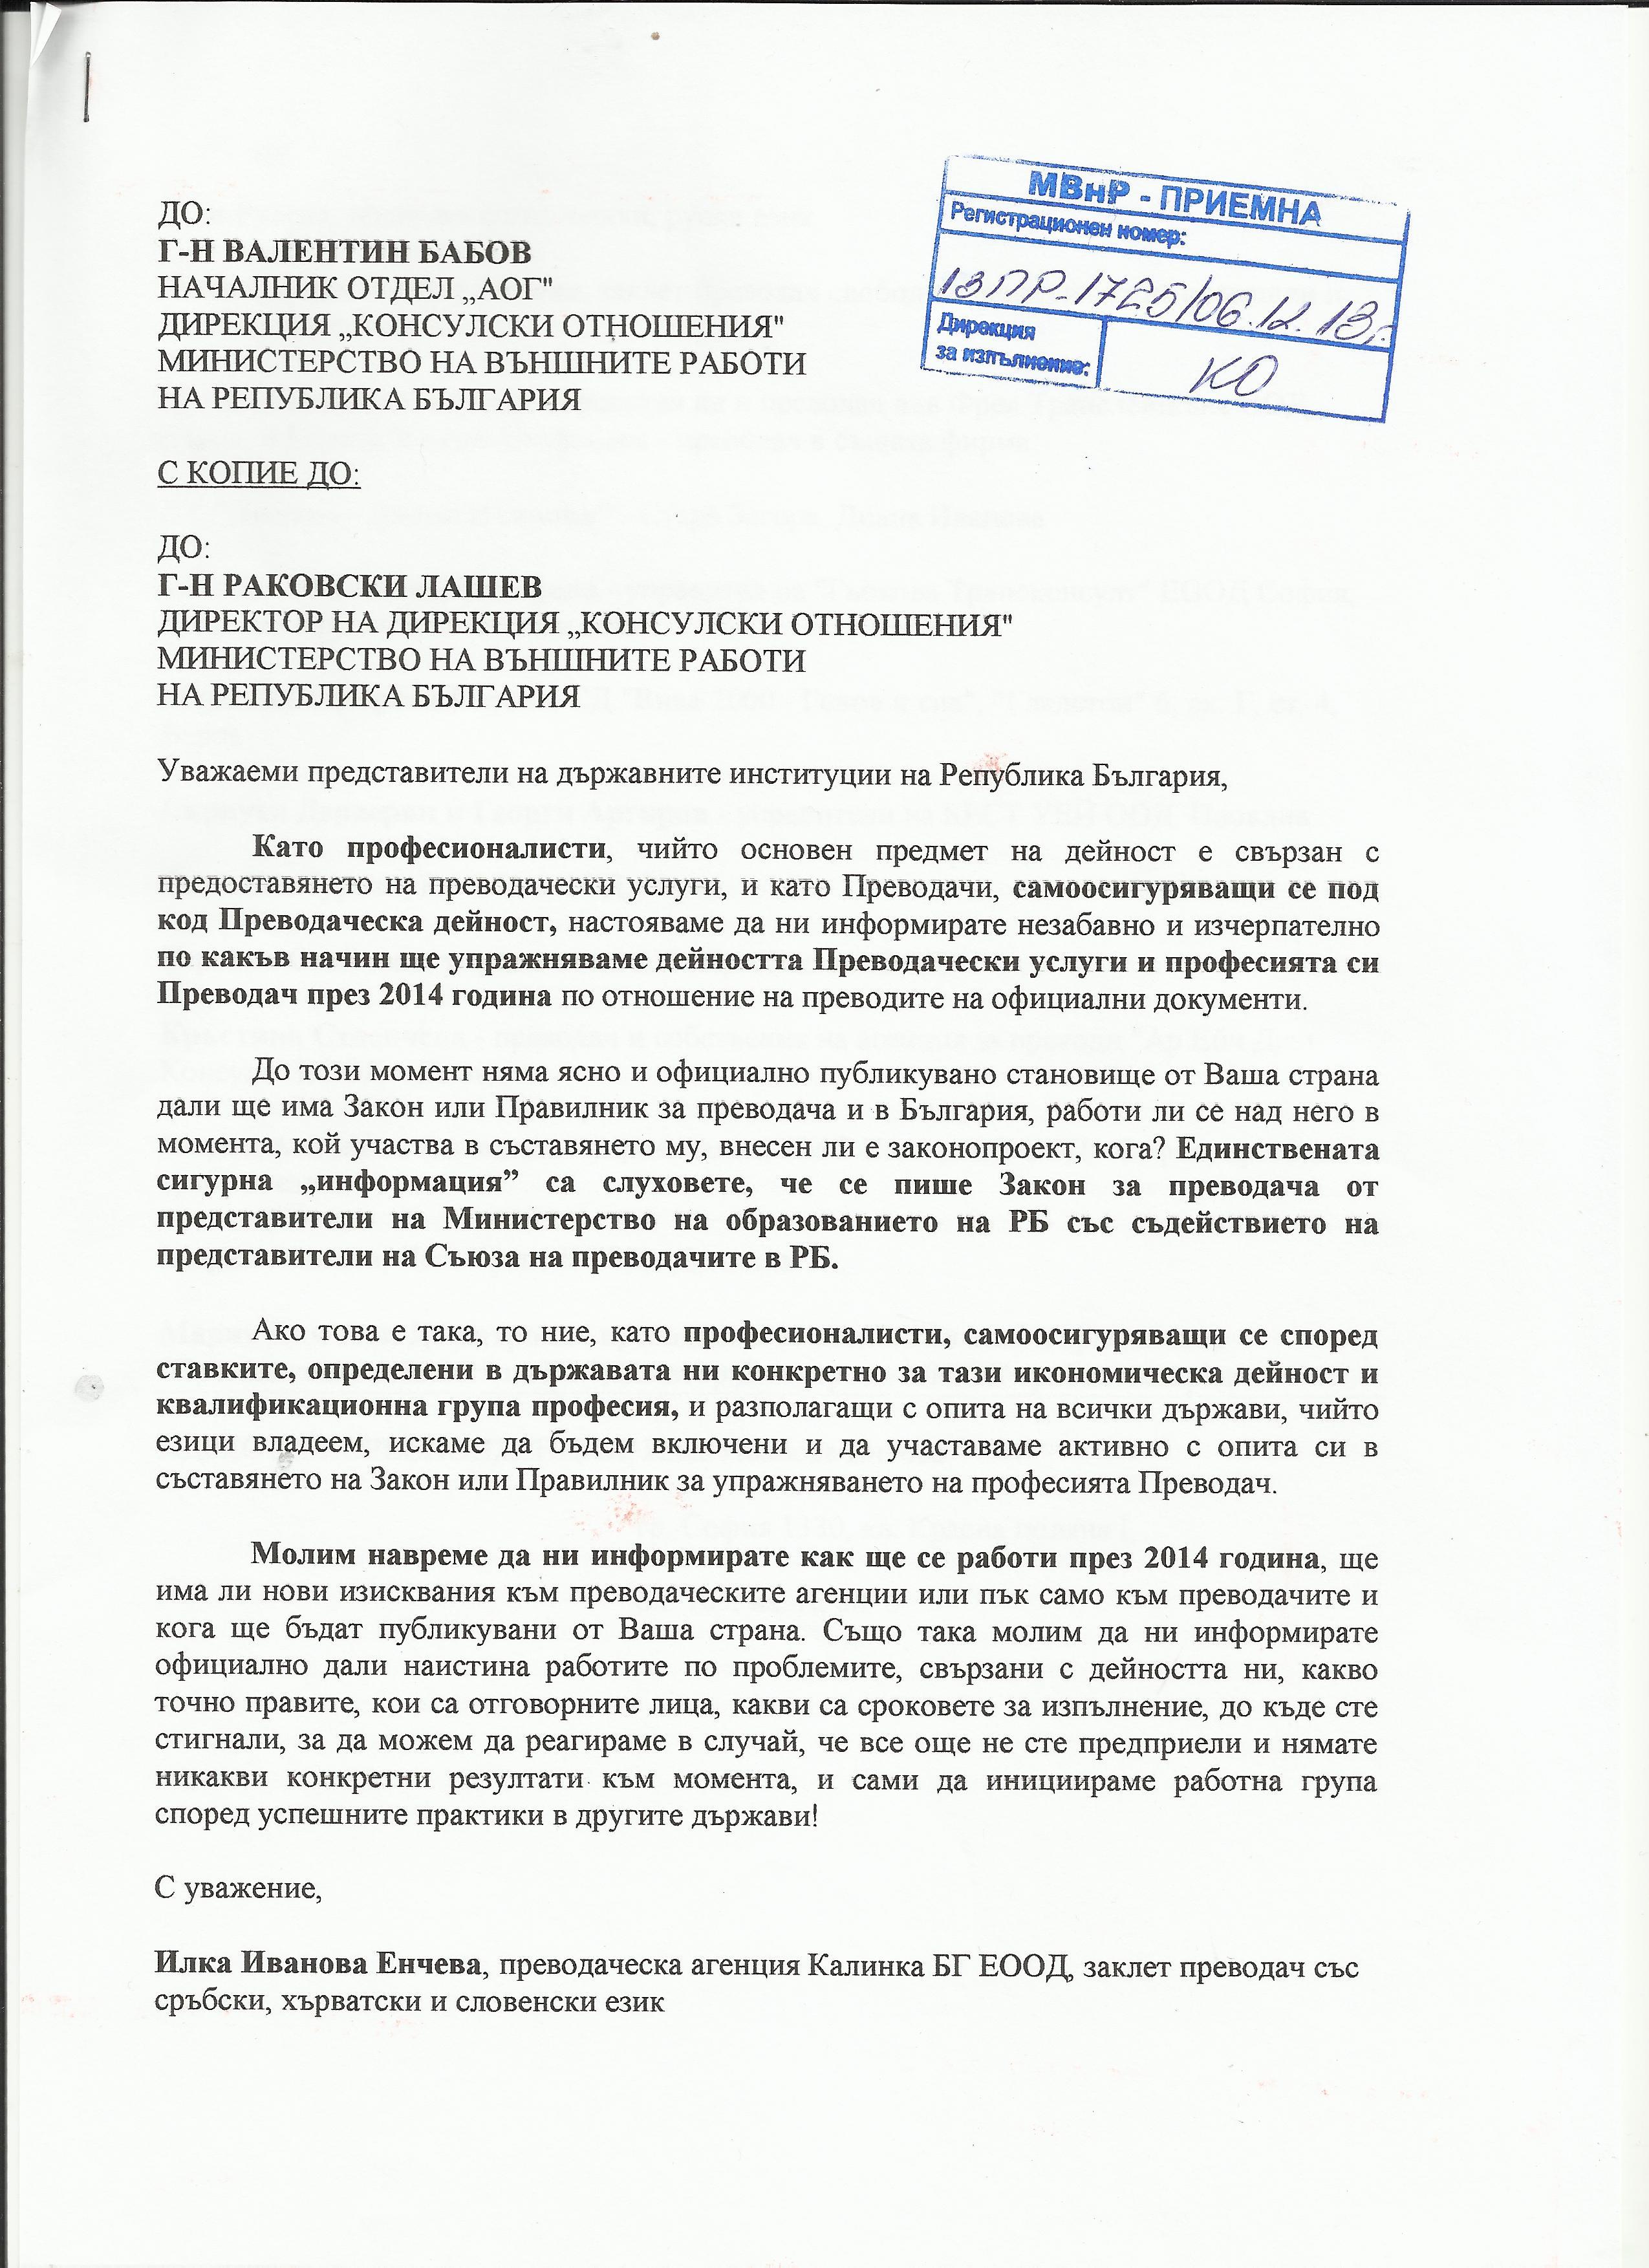 PismoPrevodachiIlkaEncheva1